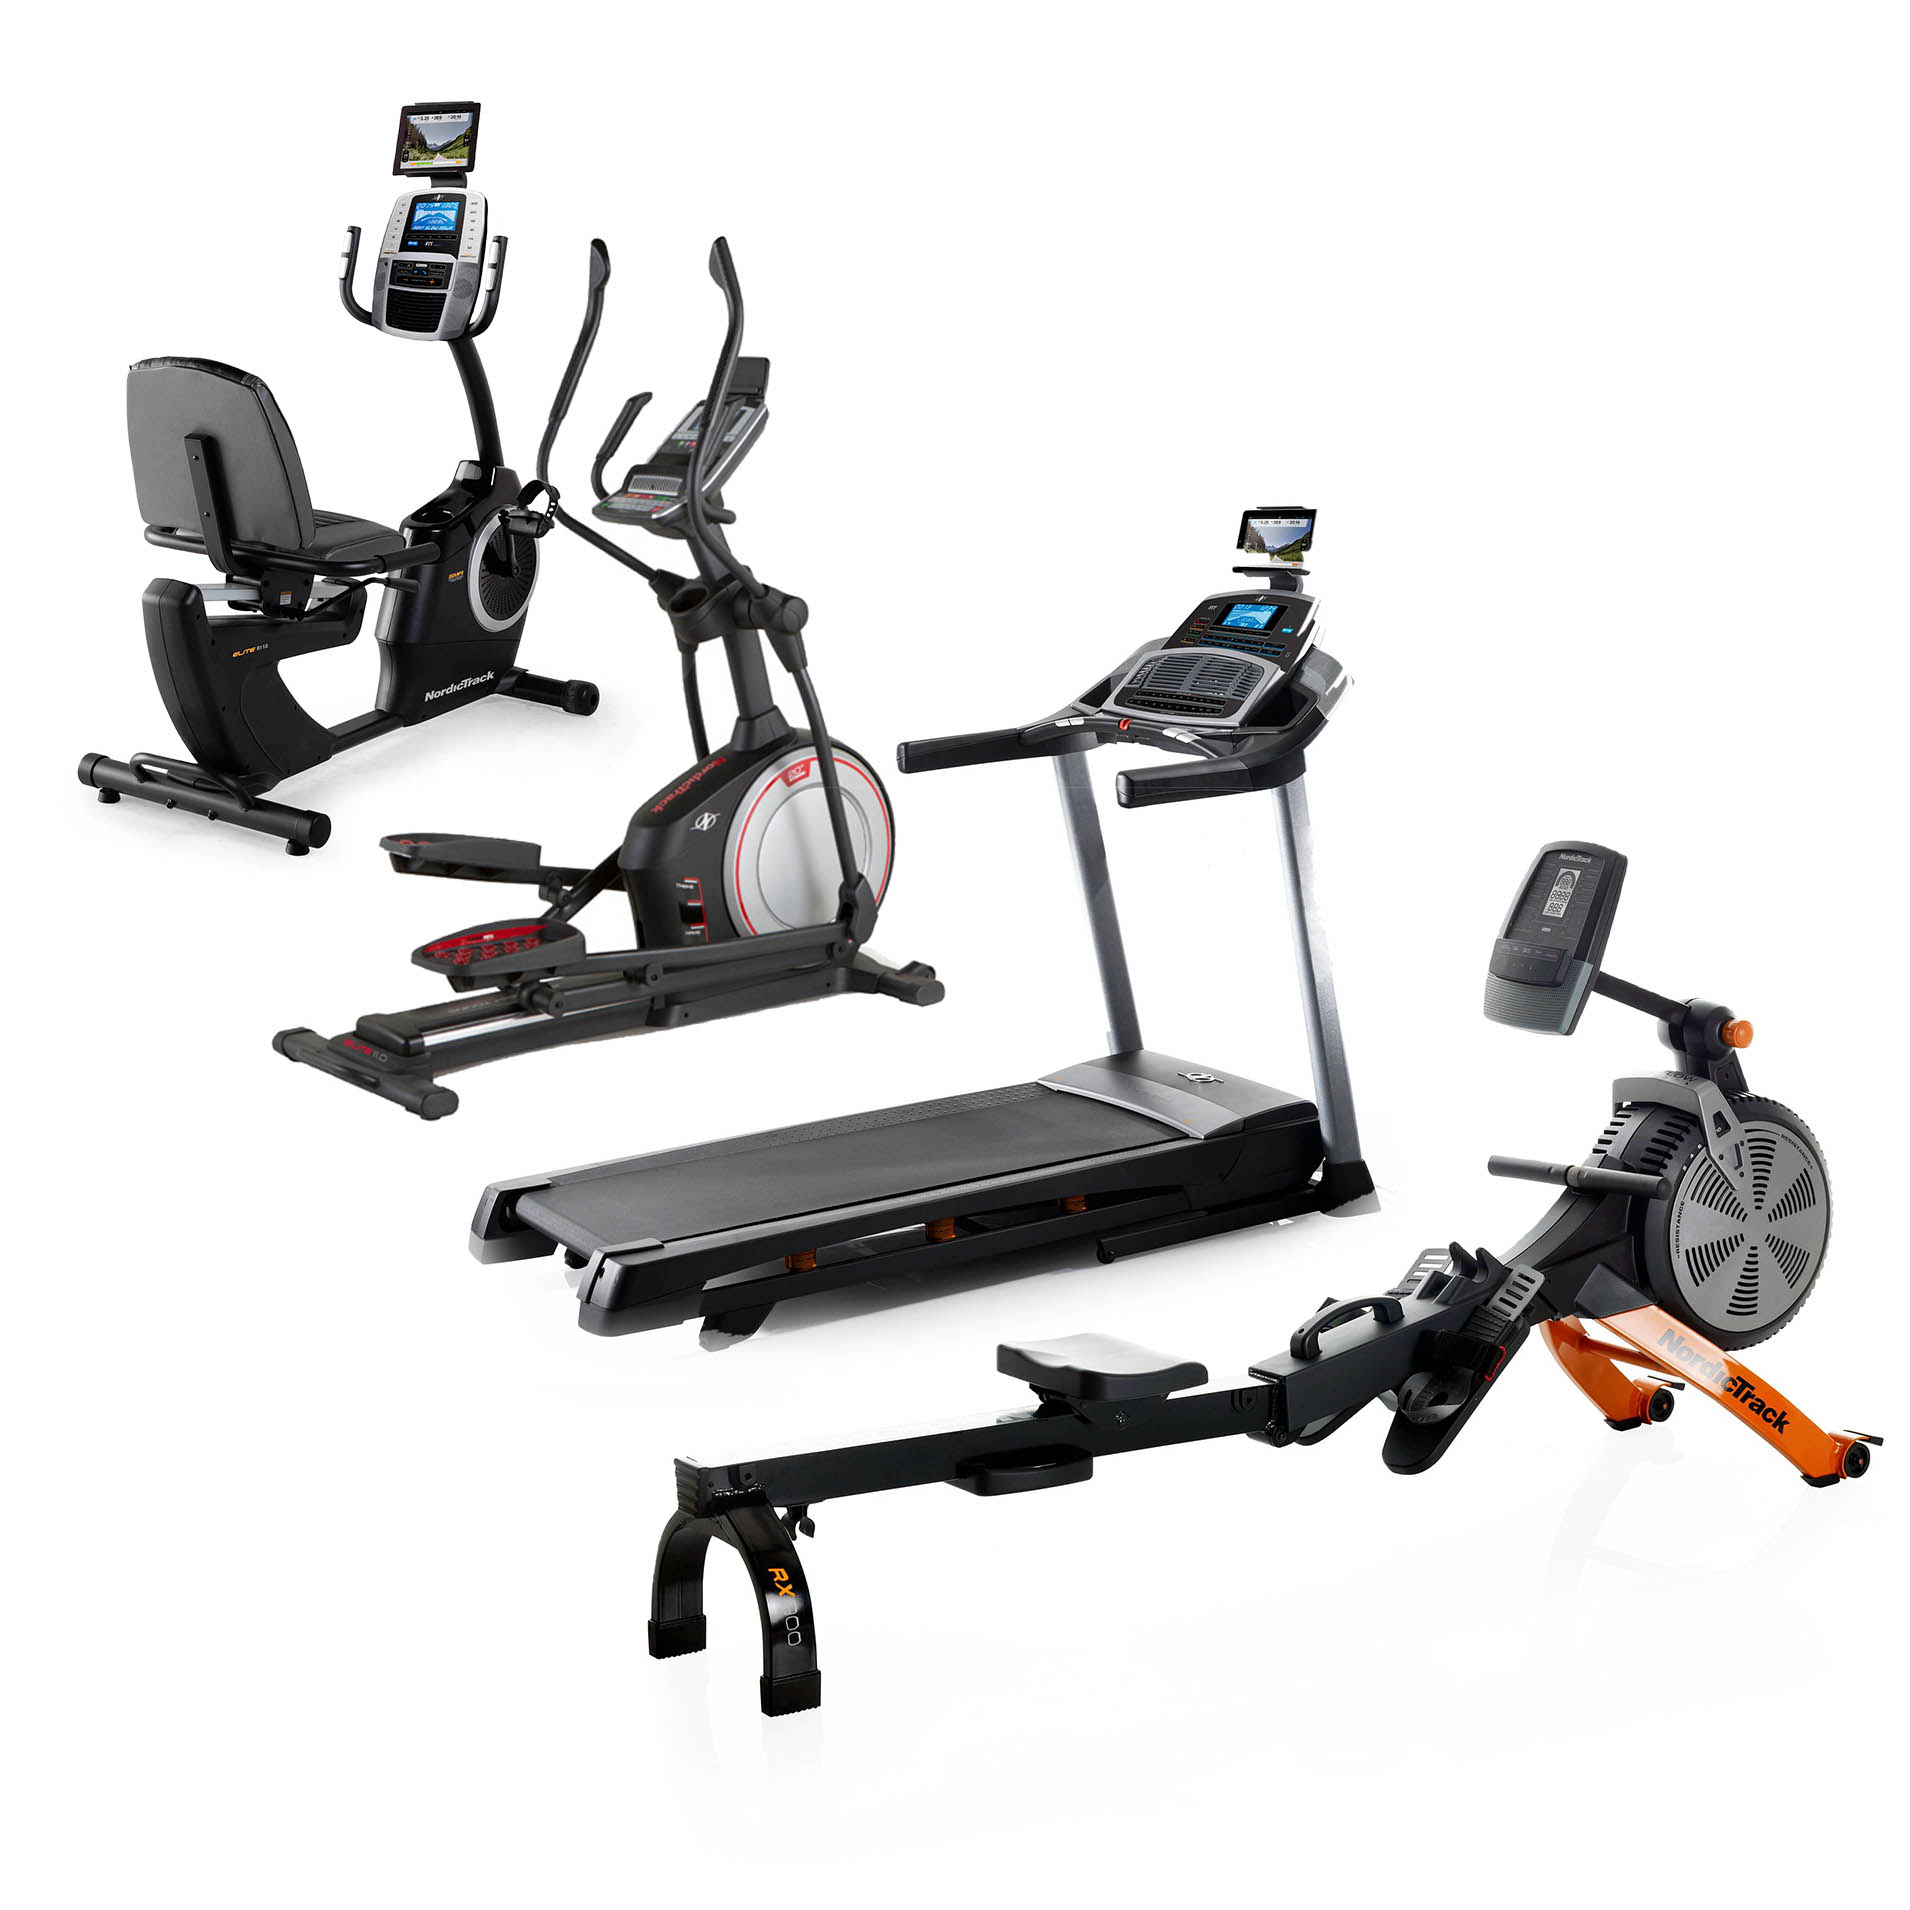 NordicTrack Complete Home Fitness Set